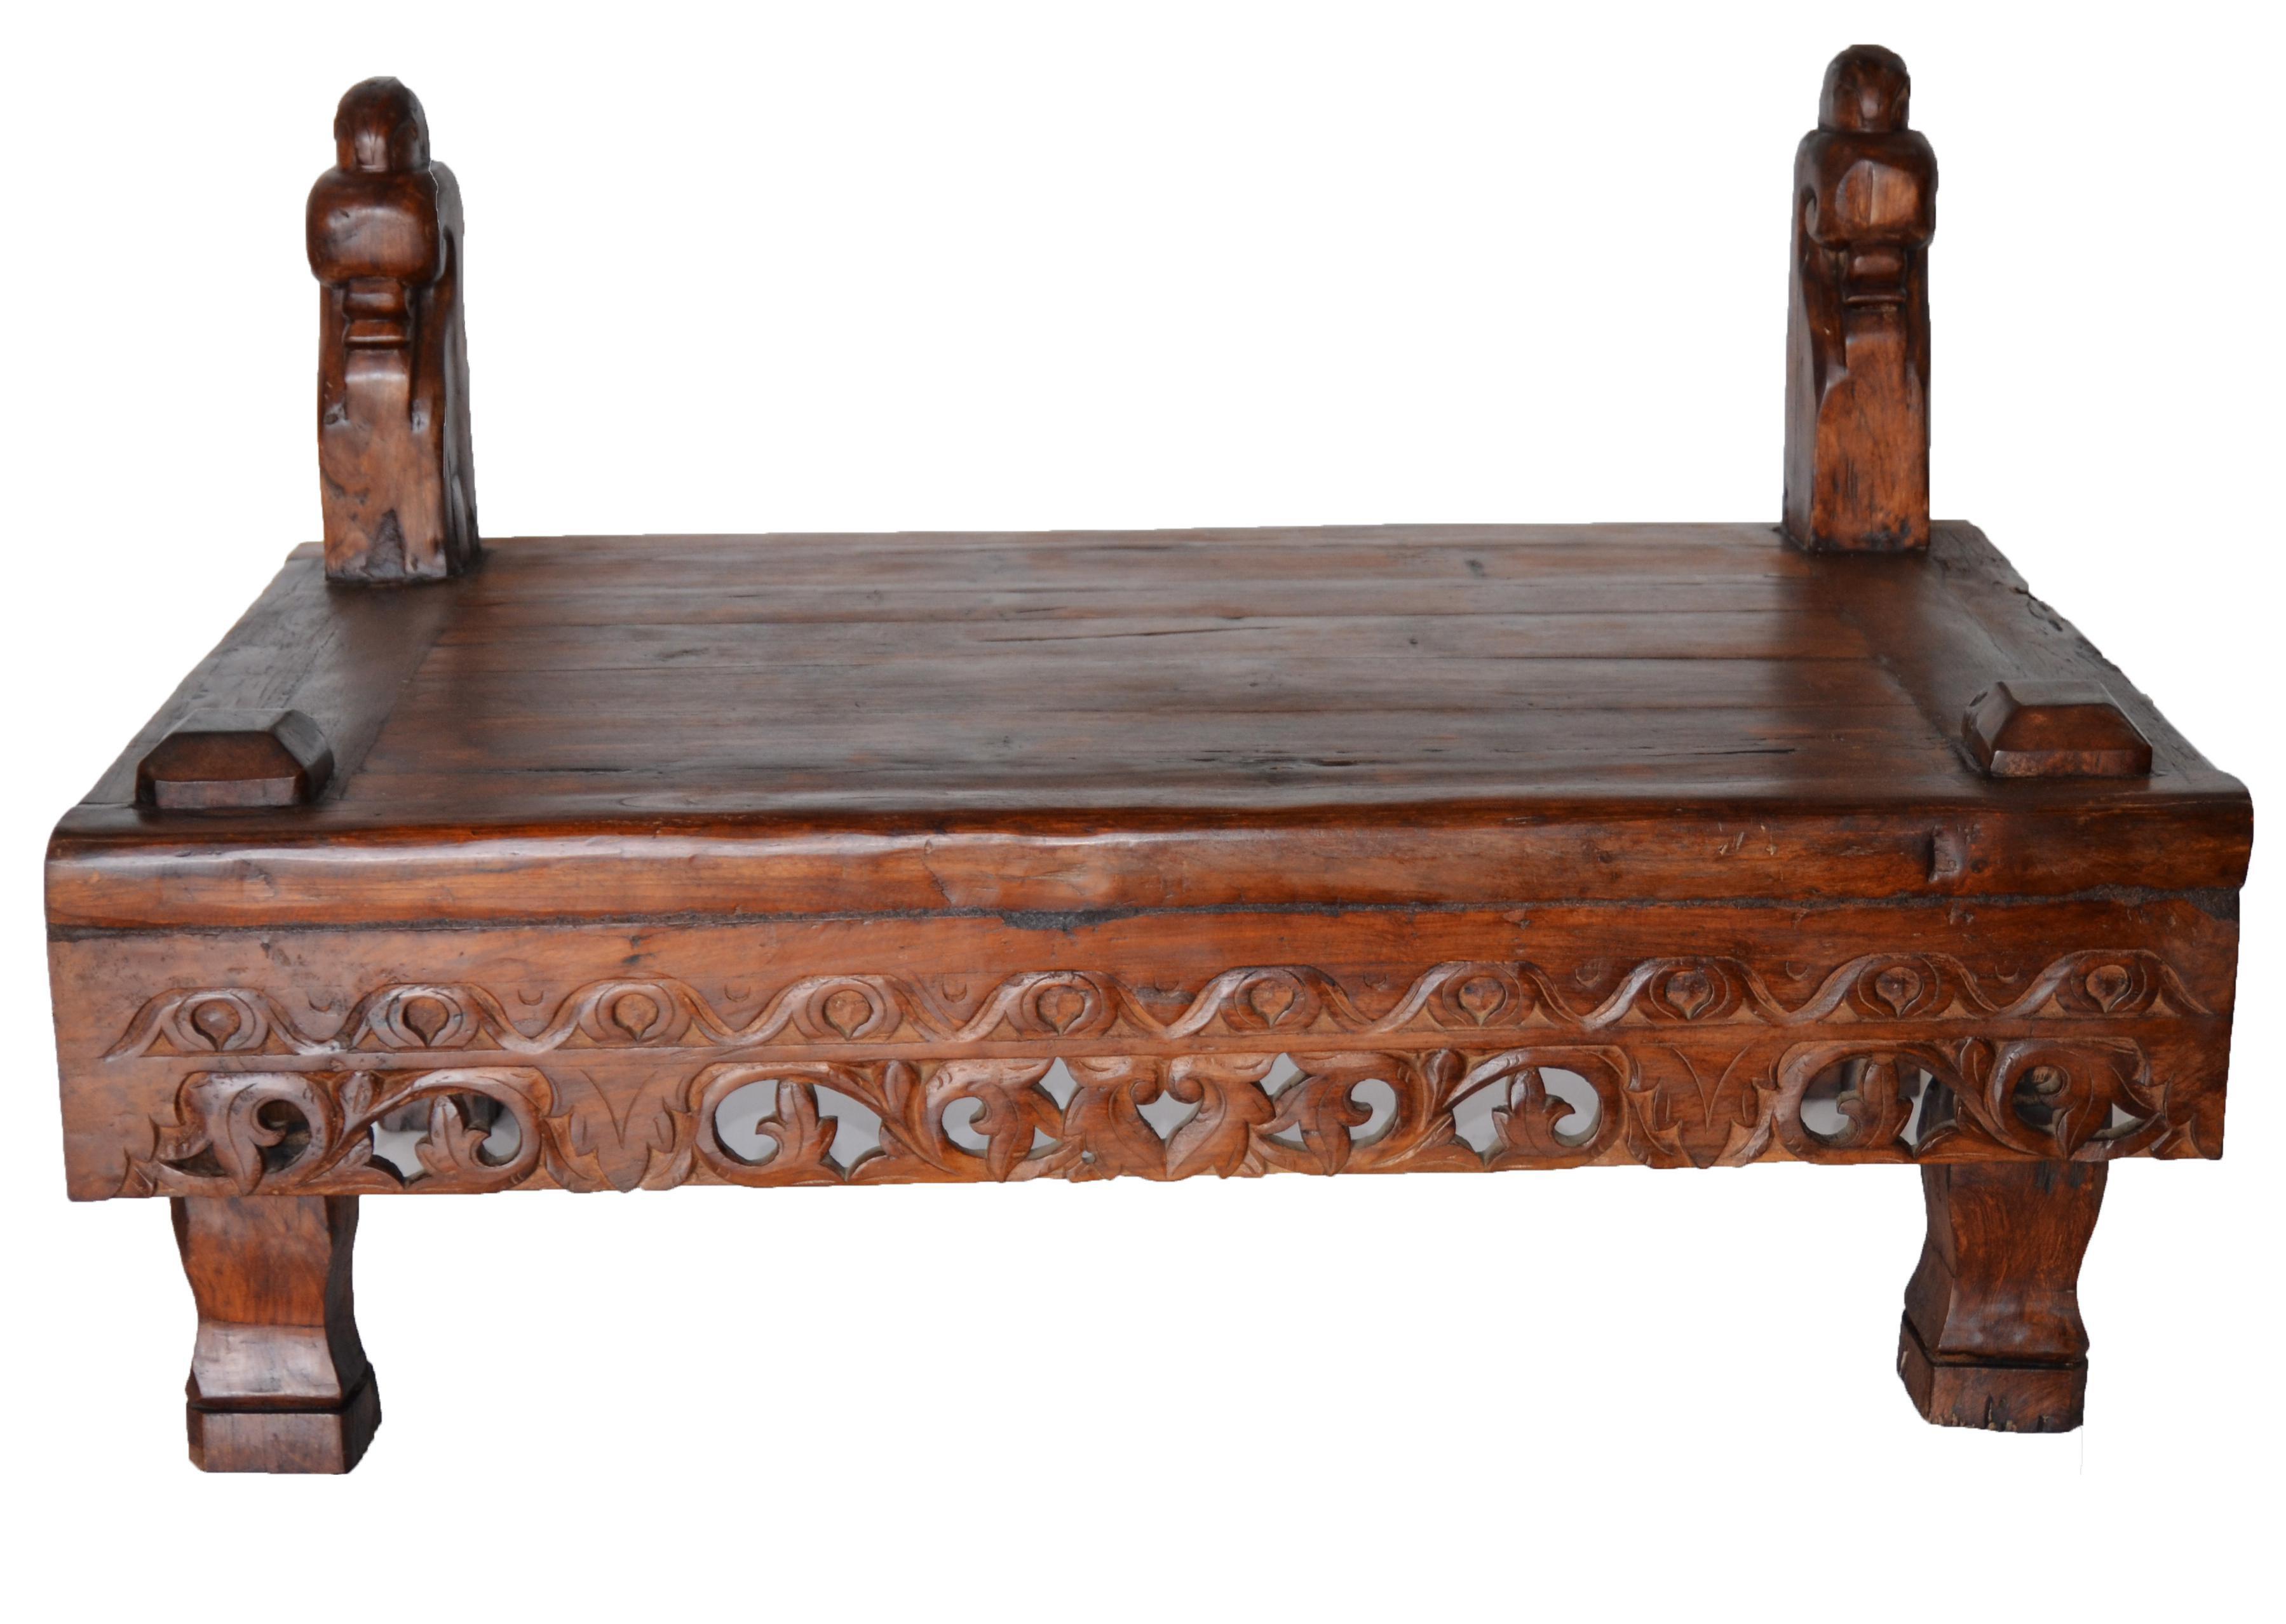 Vintage Indonesian Carved Teak Coffee Table